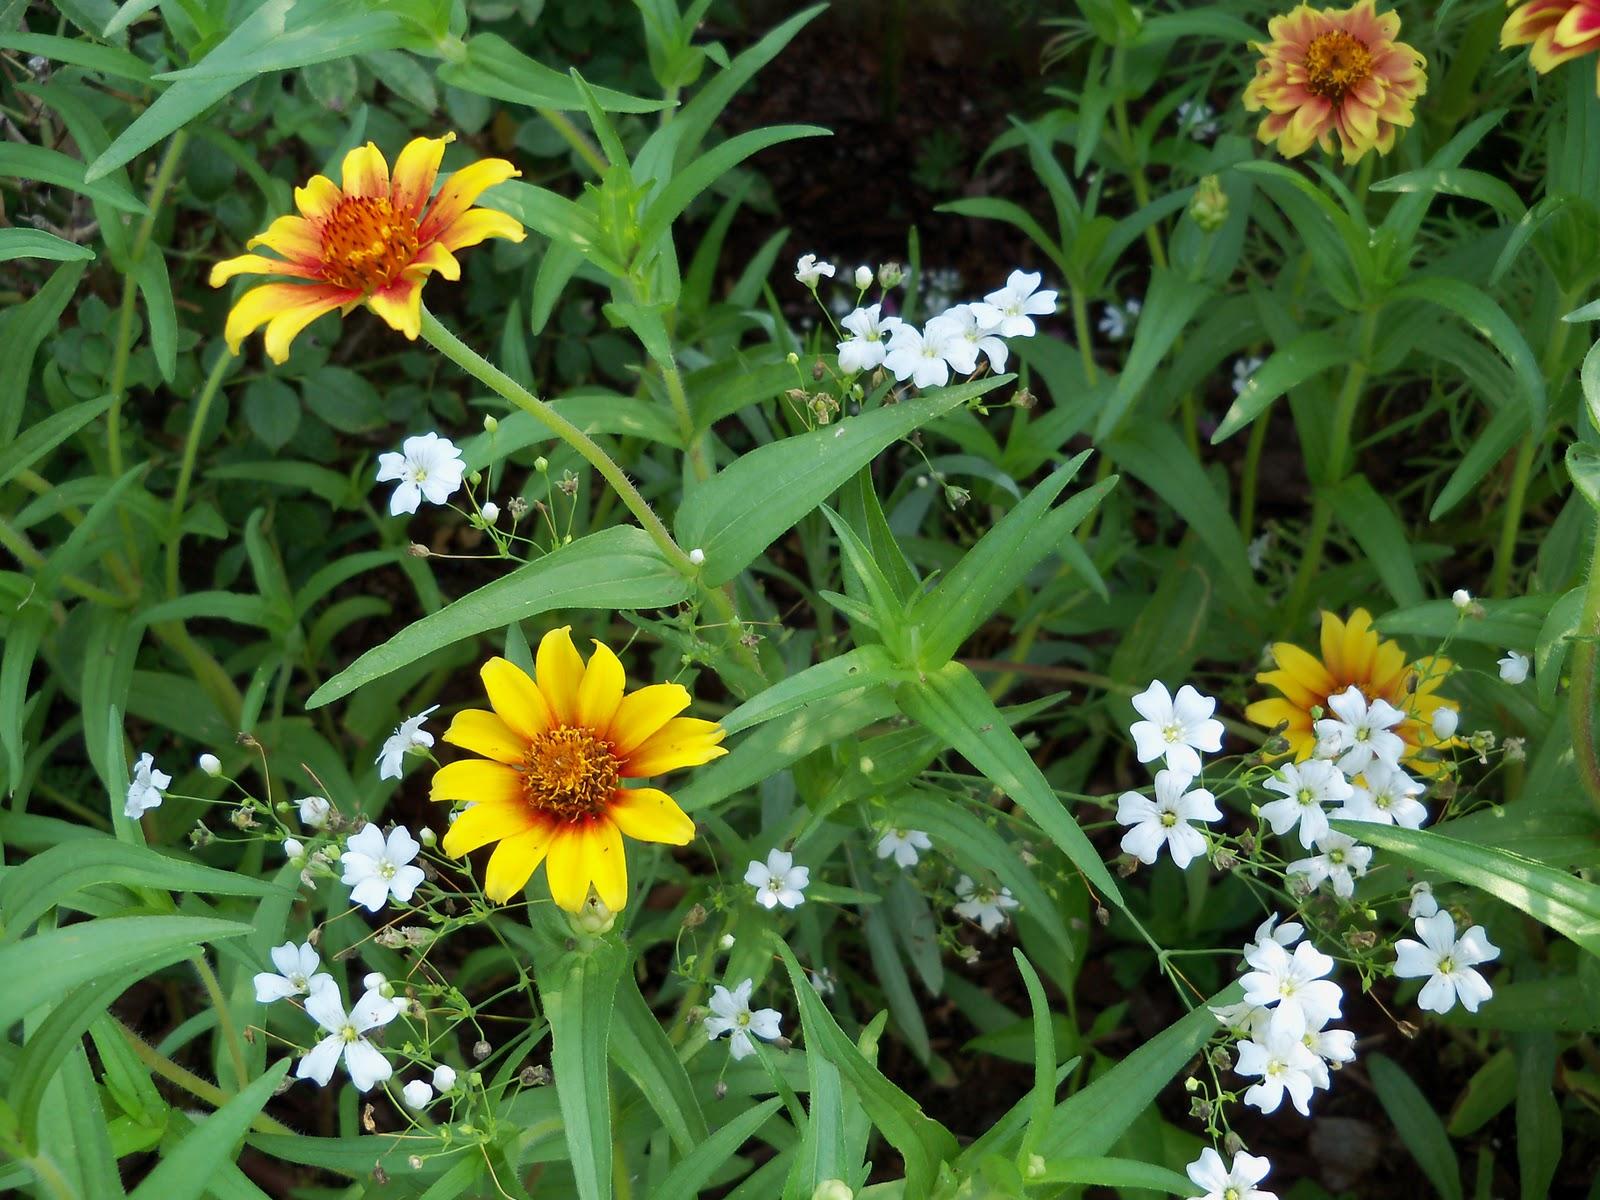 Gardening 2010, Part Two - 101_3302.JPG